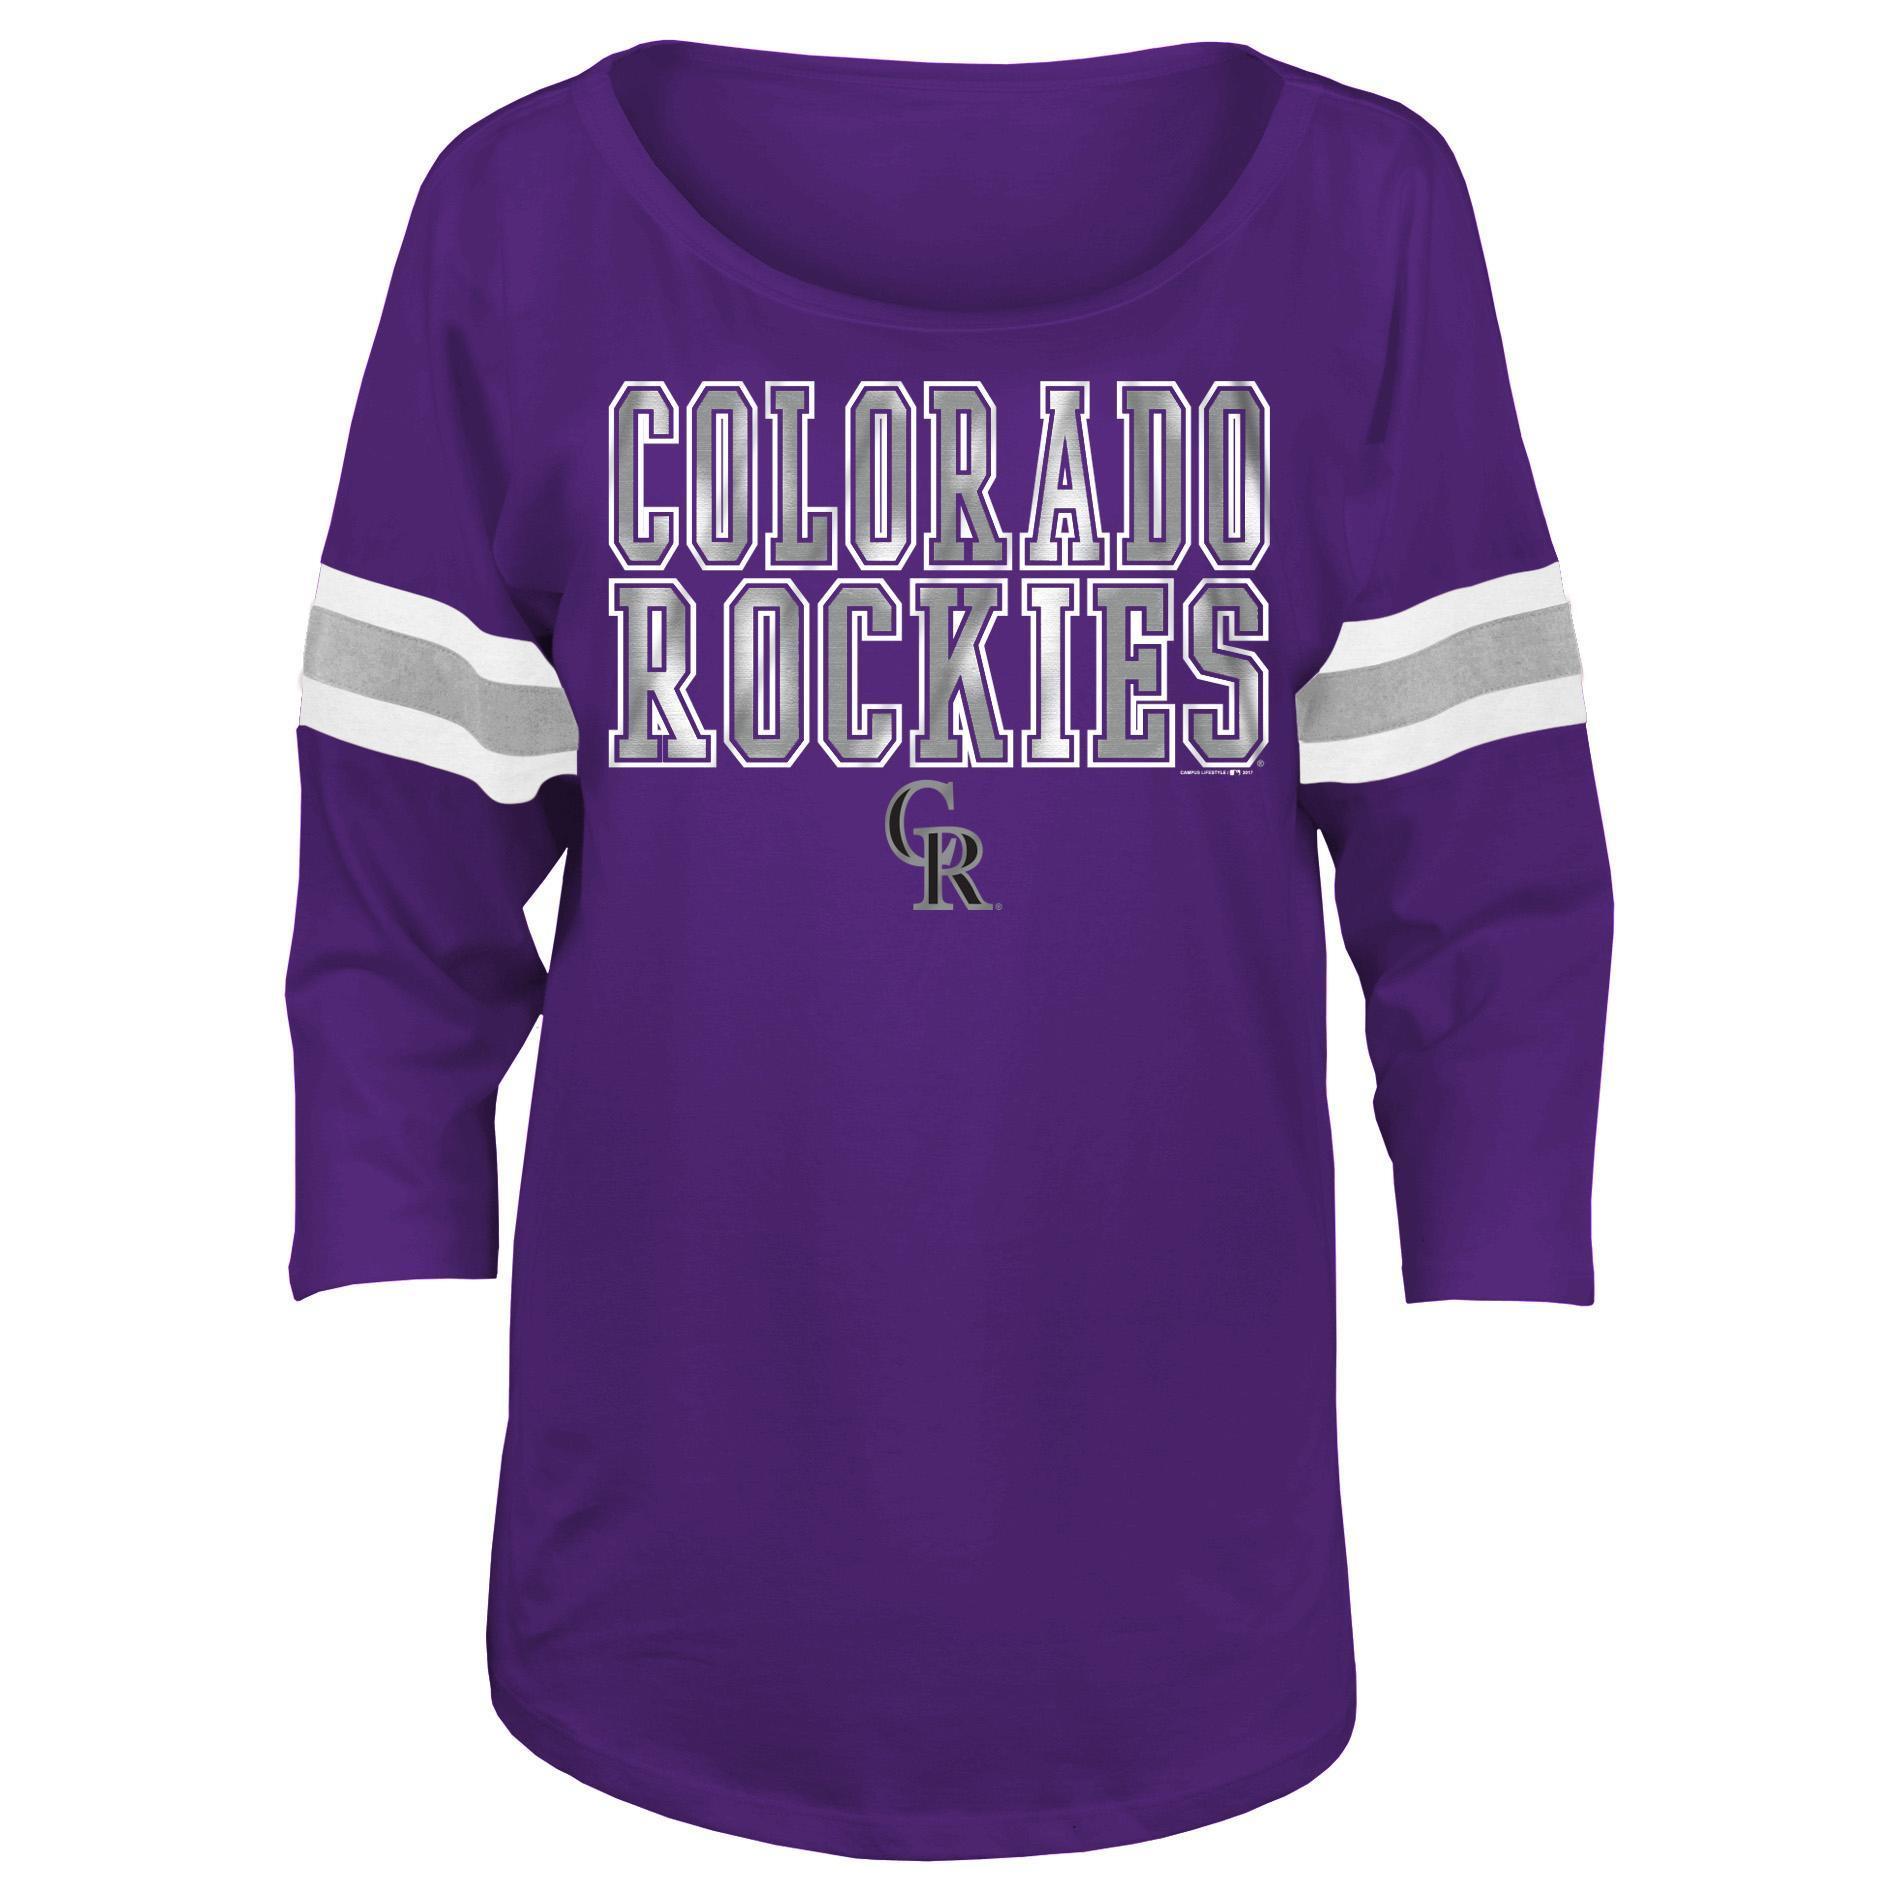 MLB Women's Plus Dolman Top - Colorado Rockies PartNumber: 046VA95492612P MfgPartNumber: 40009HPM1016433